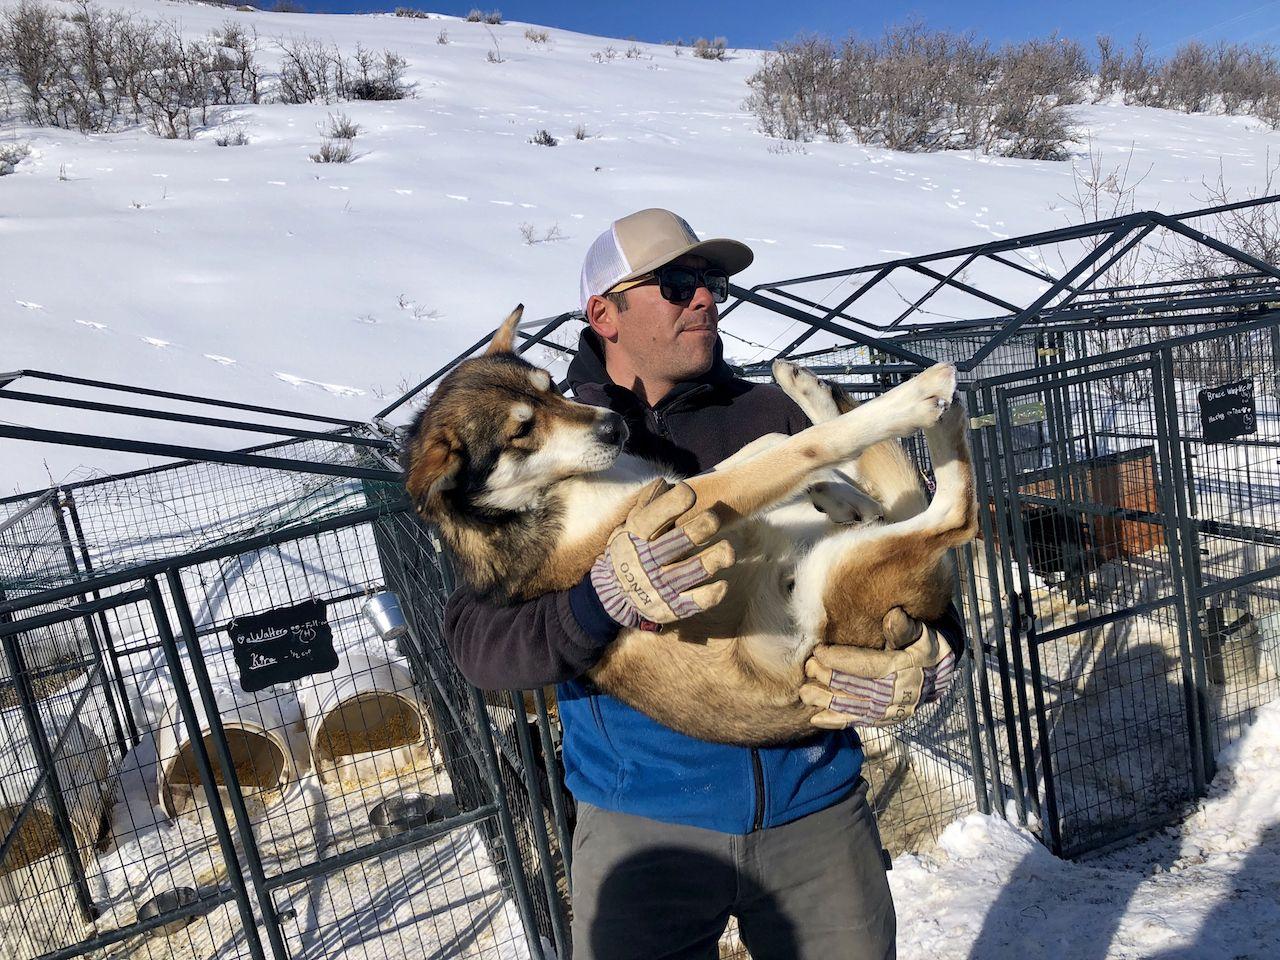 Man holding a sled dog